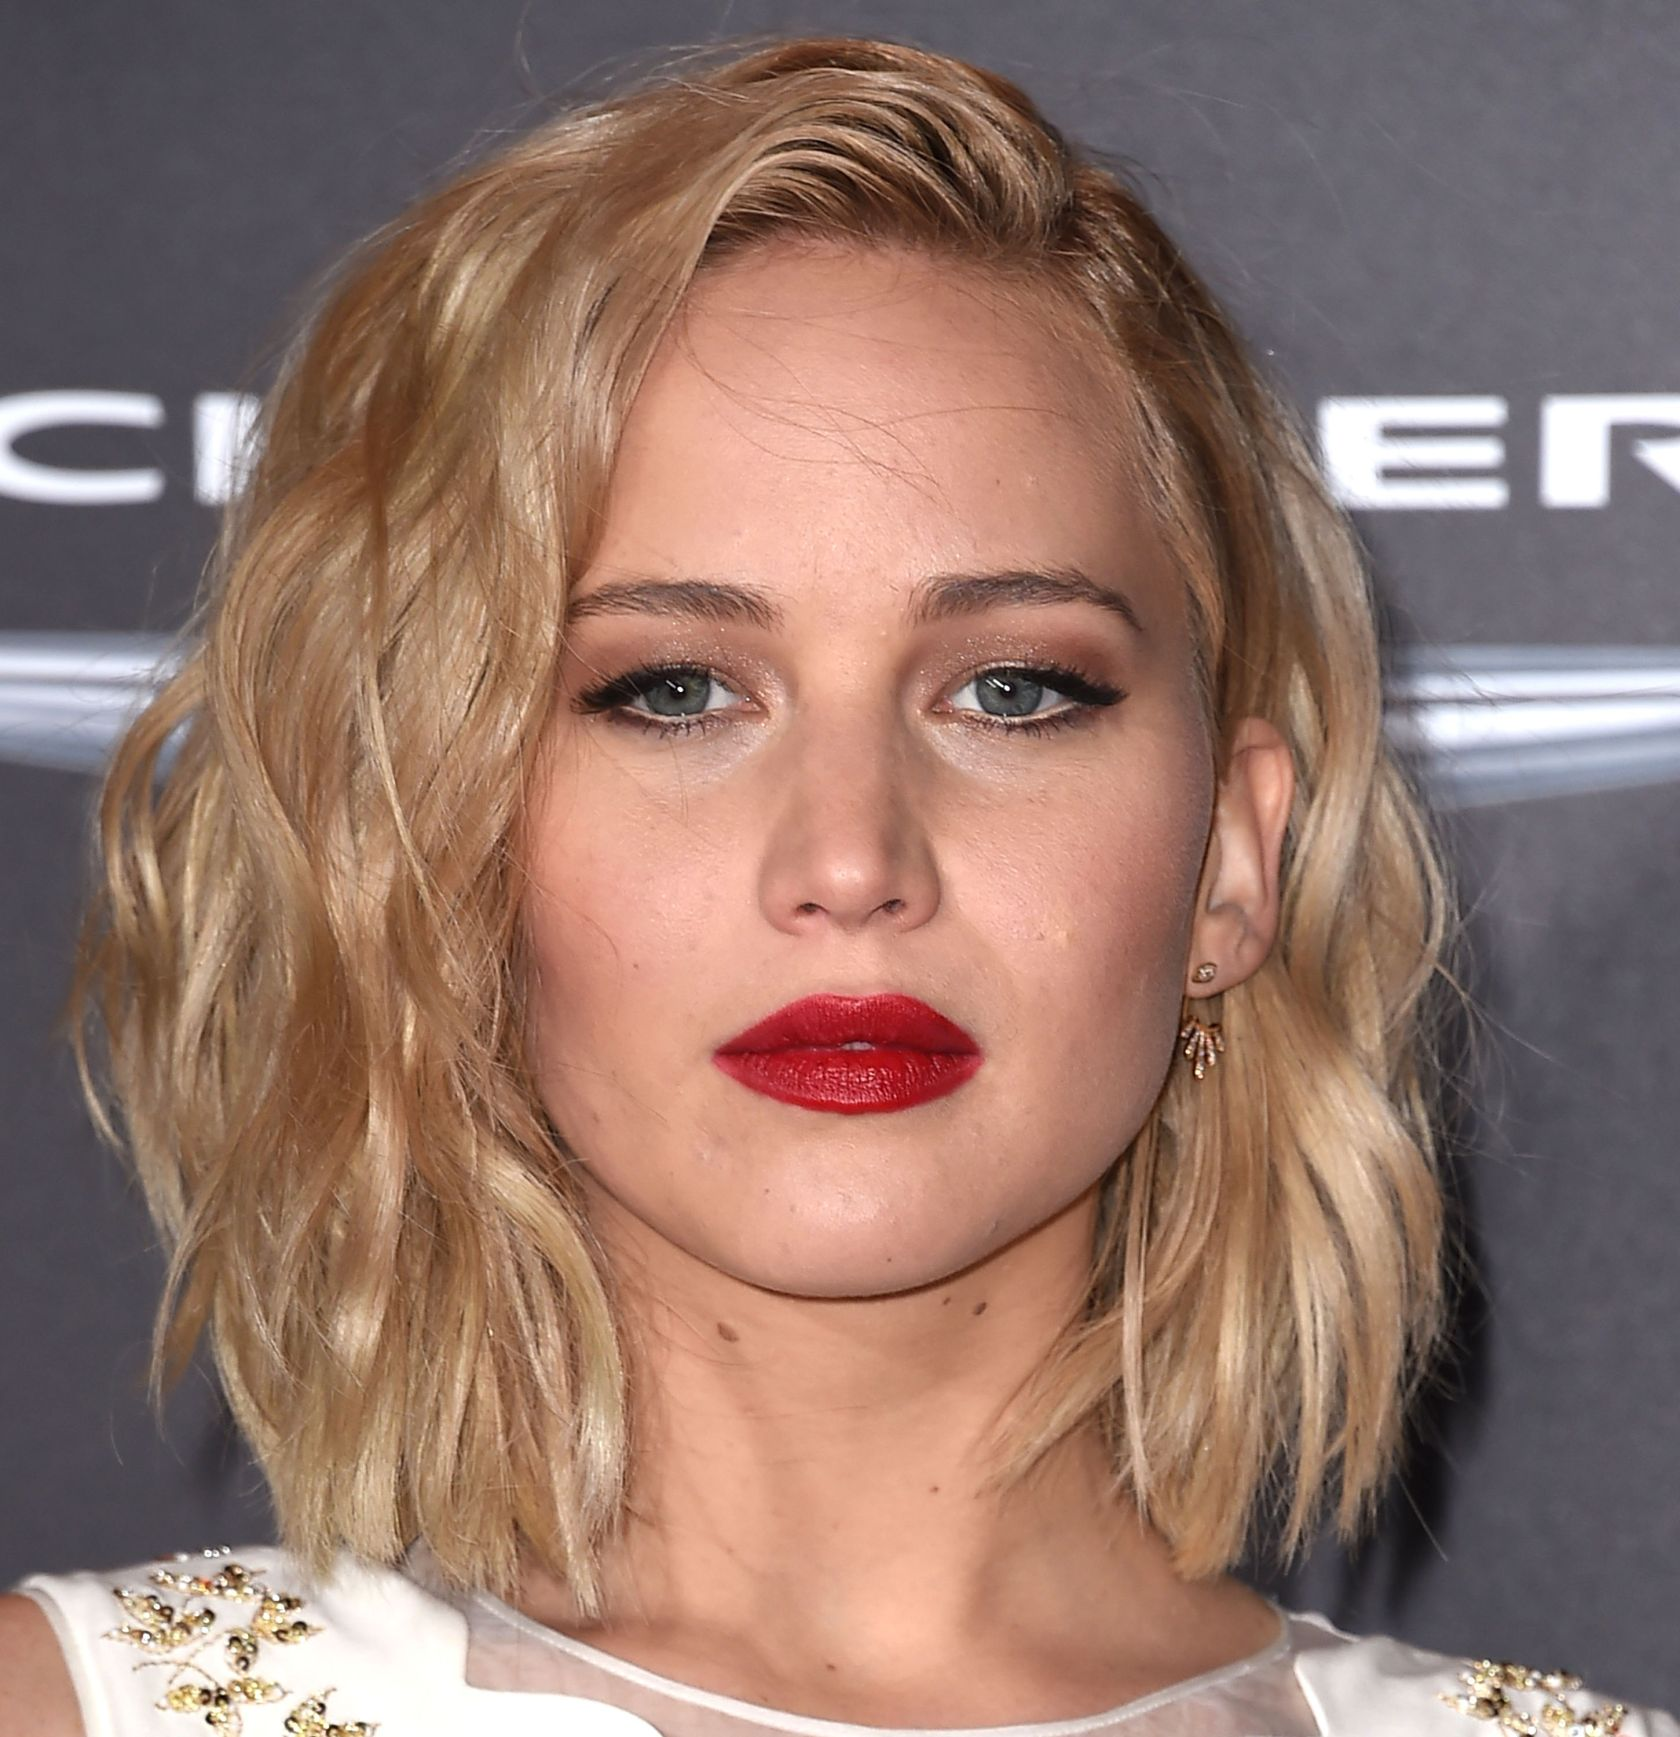 Premiere Of Lionsgate's 'The Hunger Games: Mockingjay - Part 2' - Arrivals